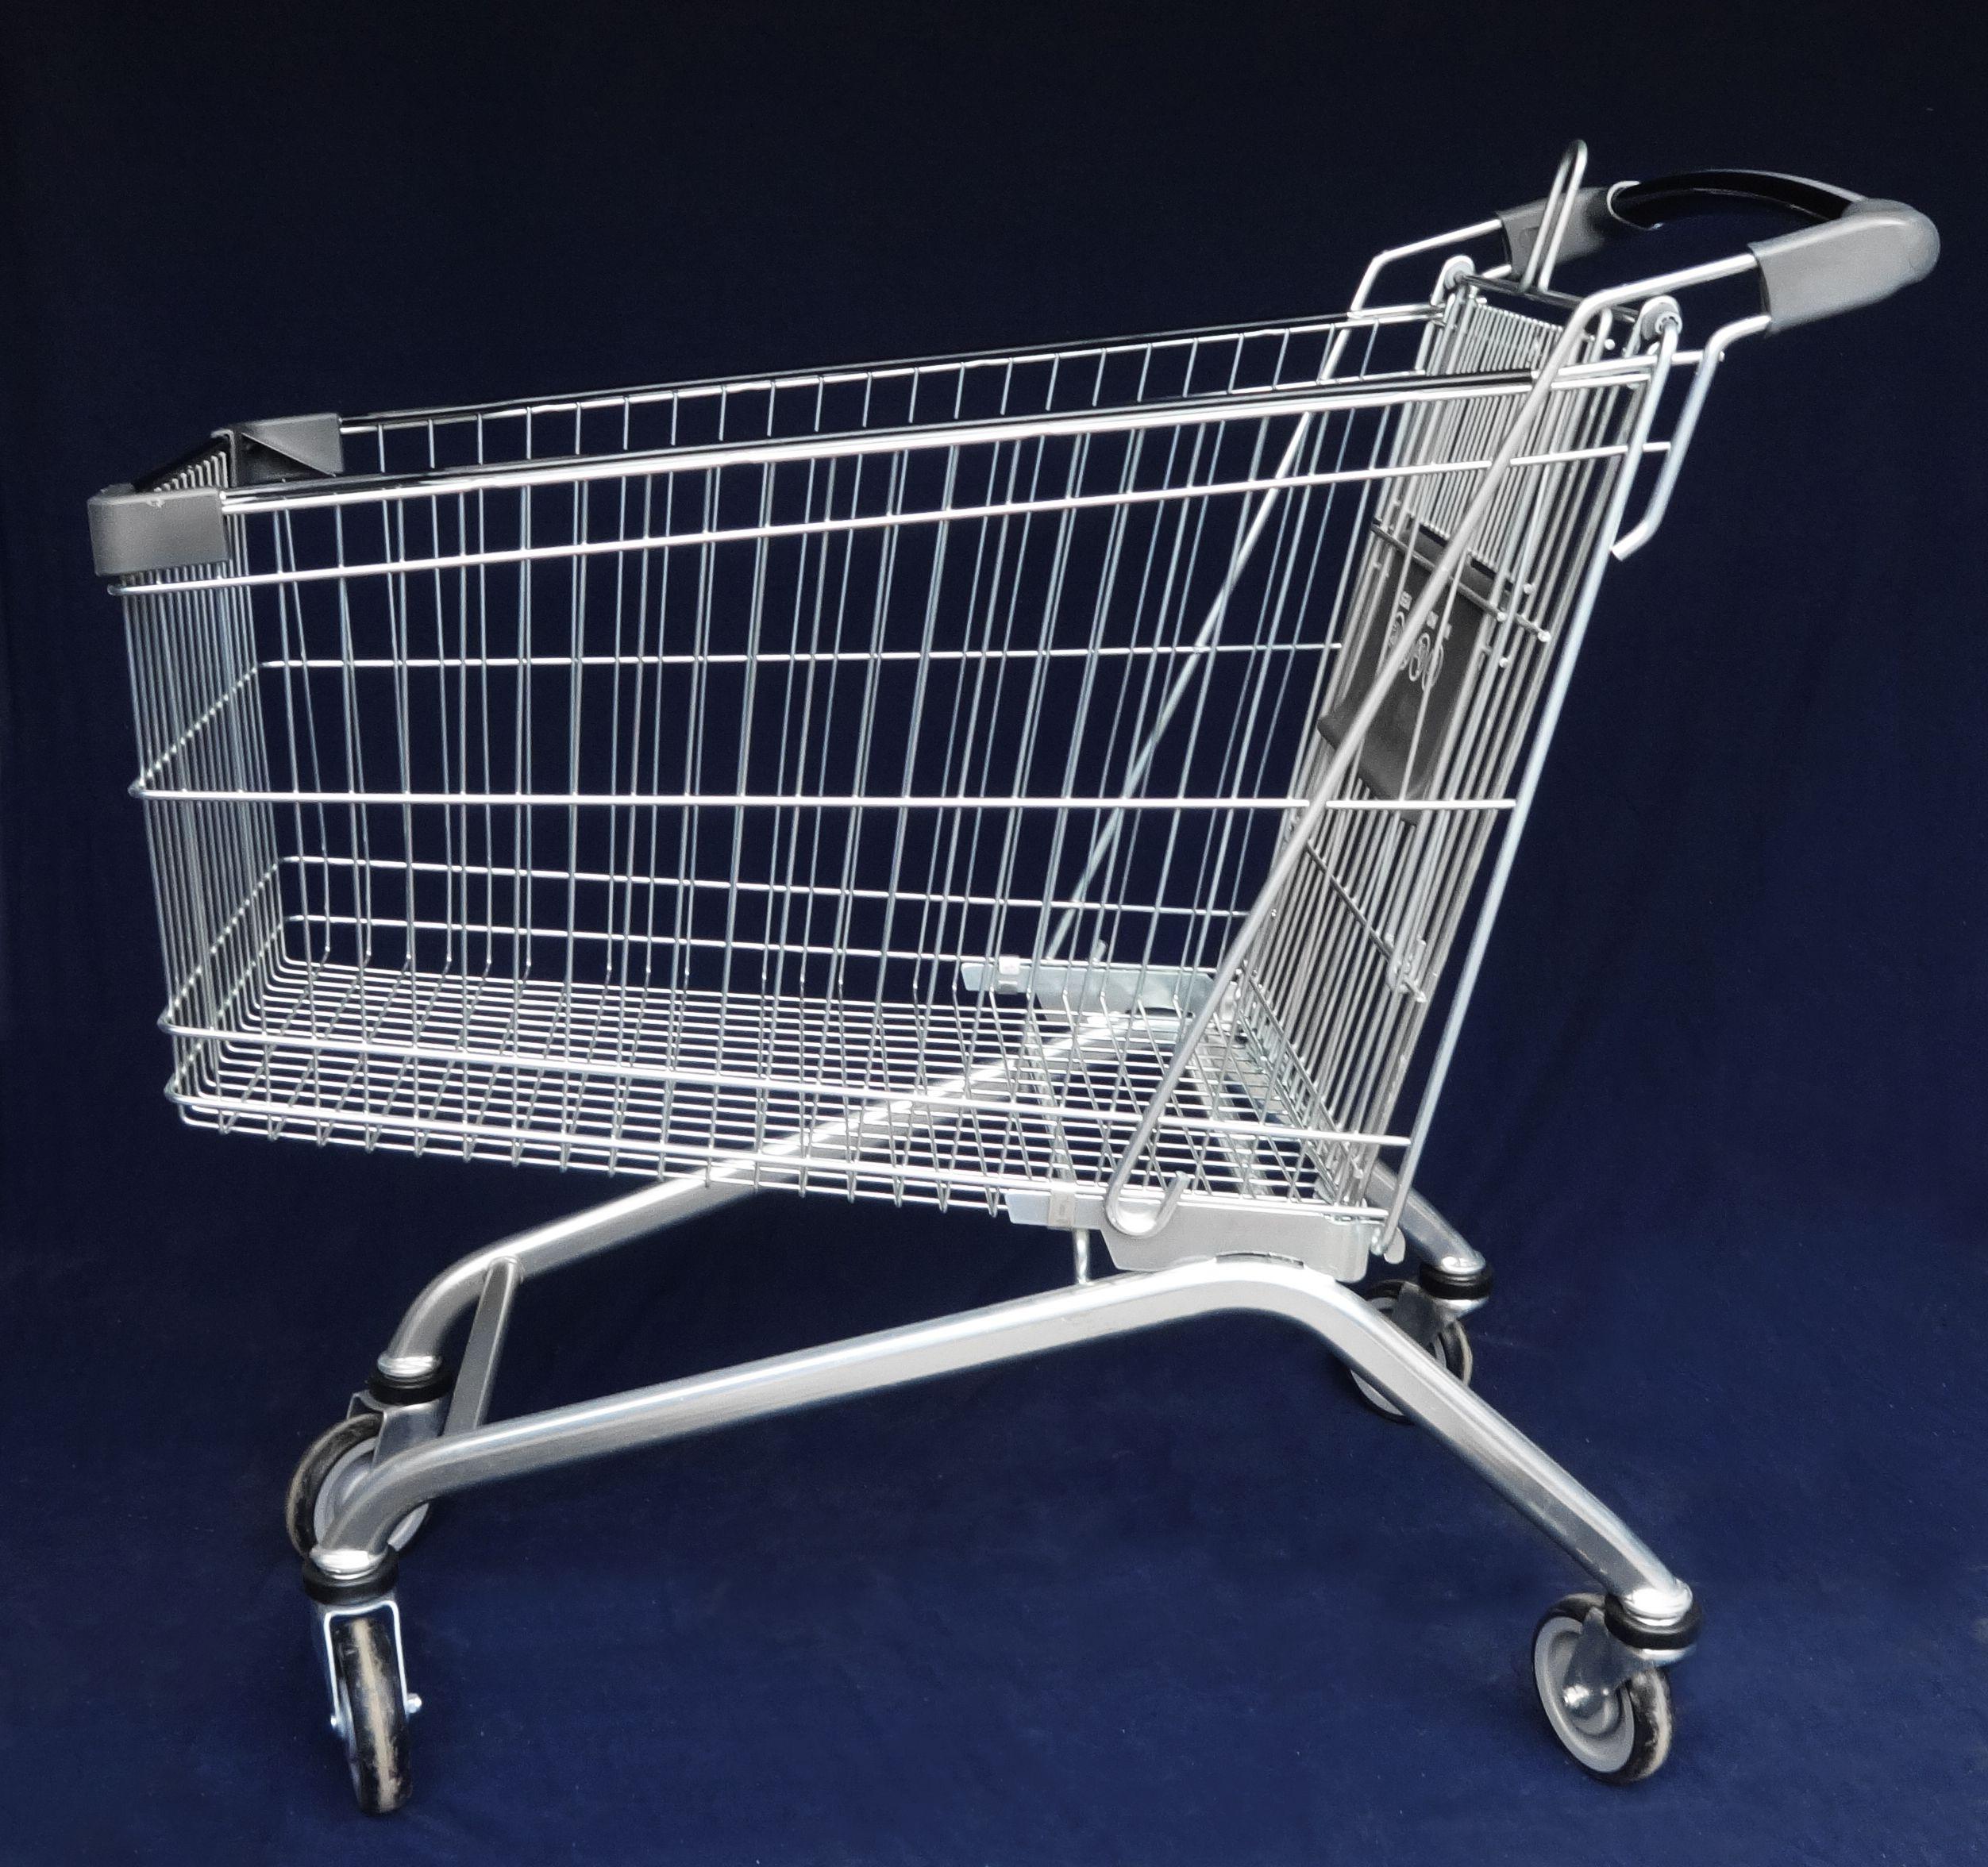 supermercado180